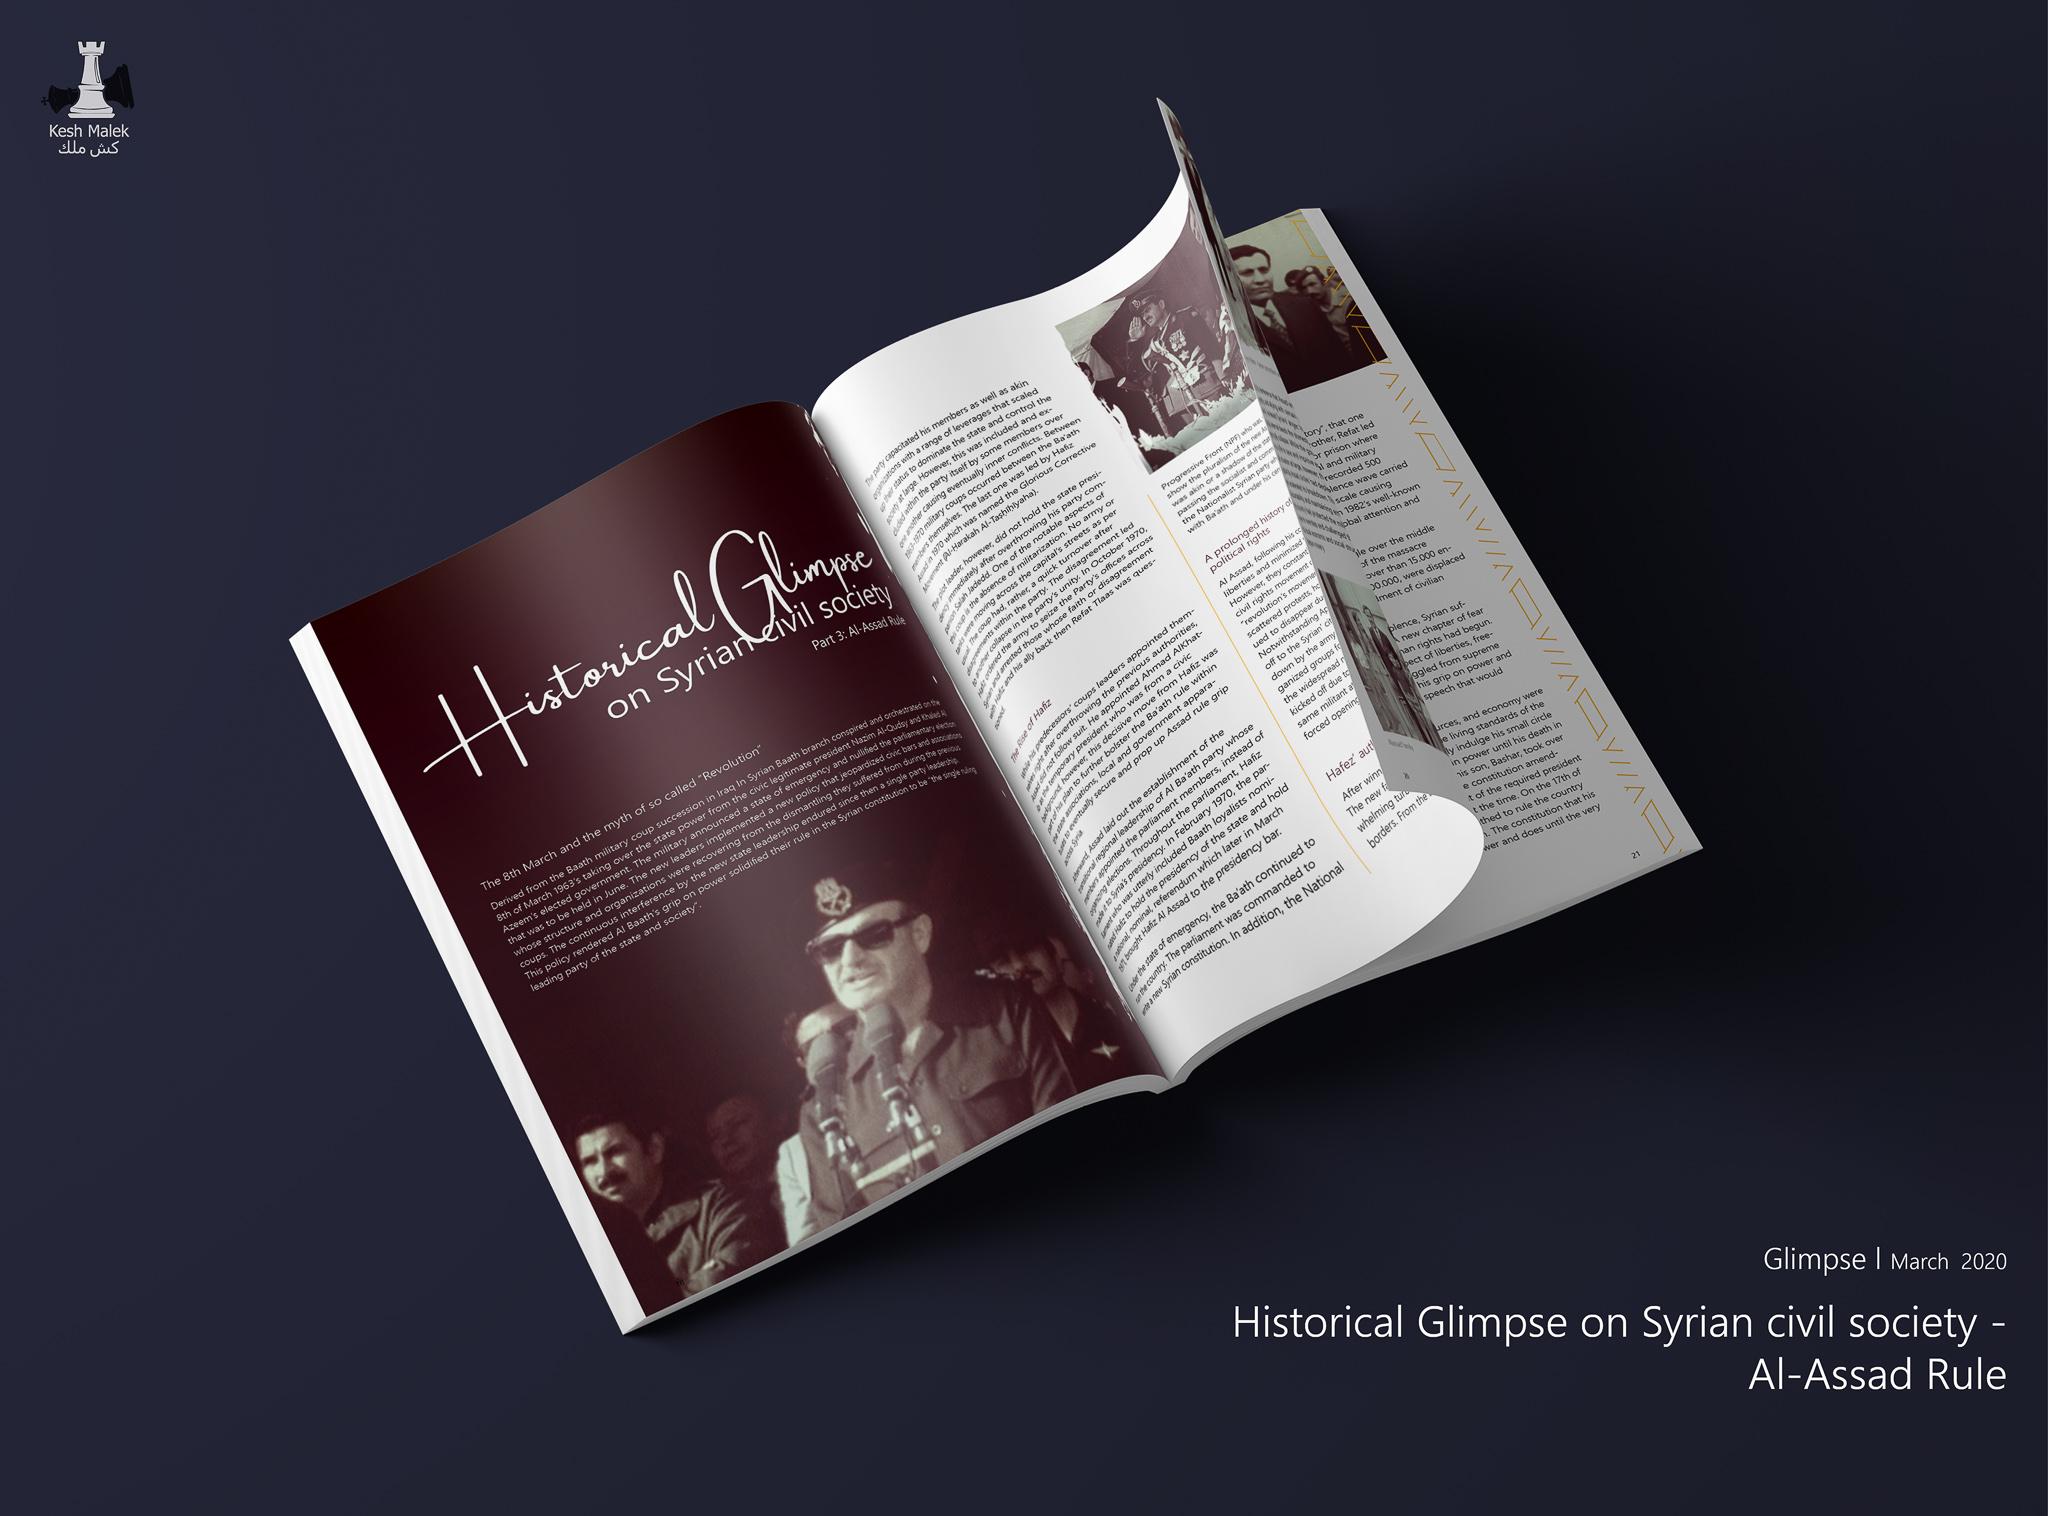 Historical Glimpse on Syrian civil society – Al-Assad Rule